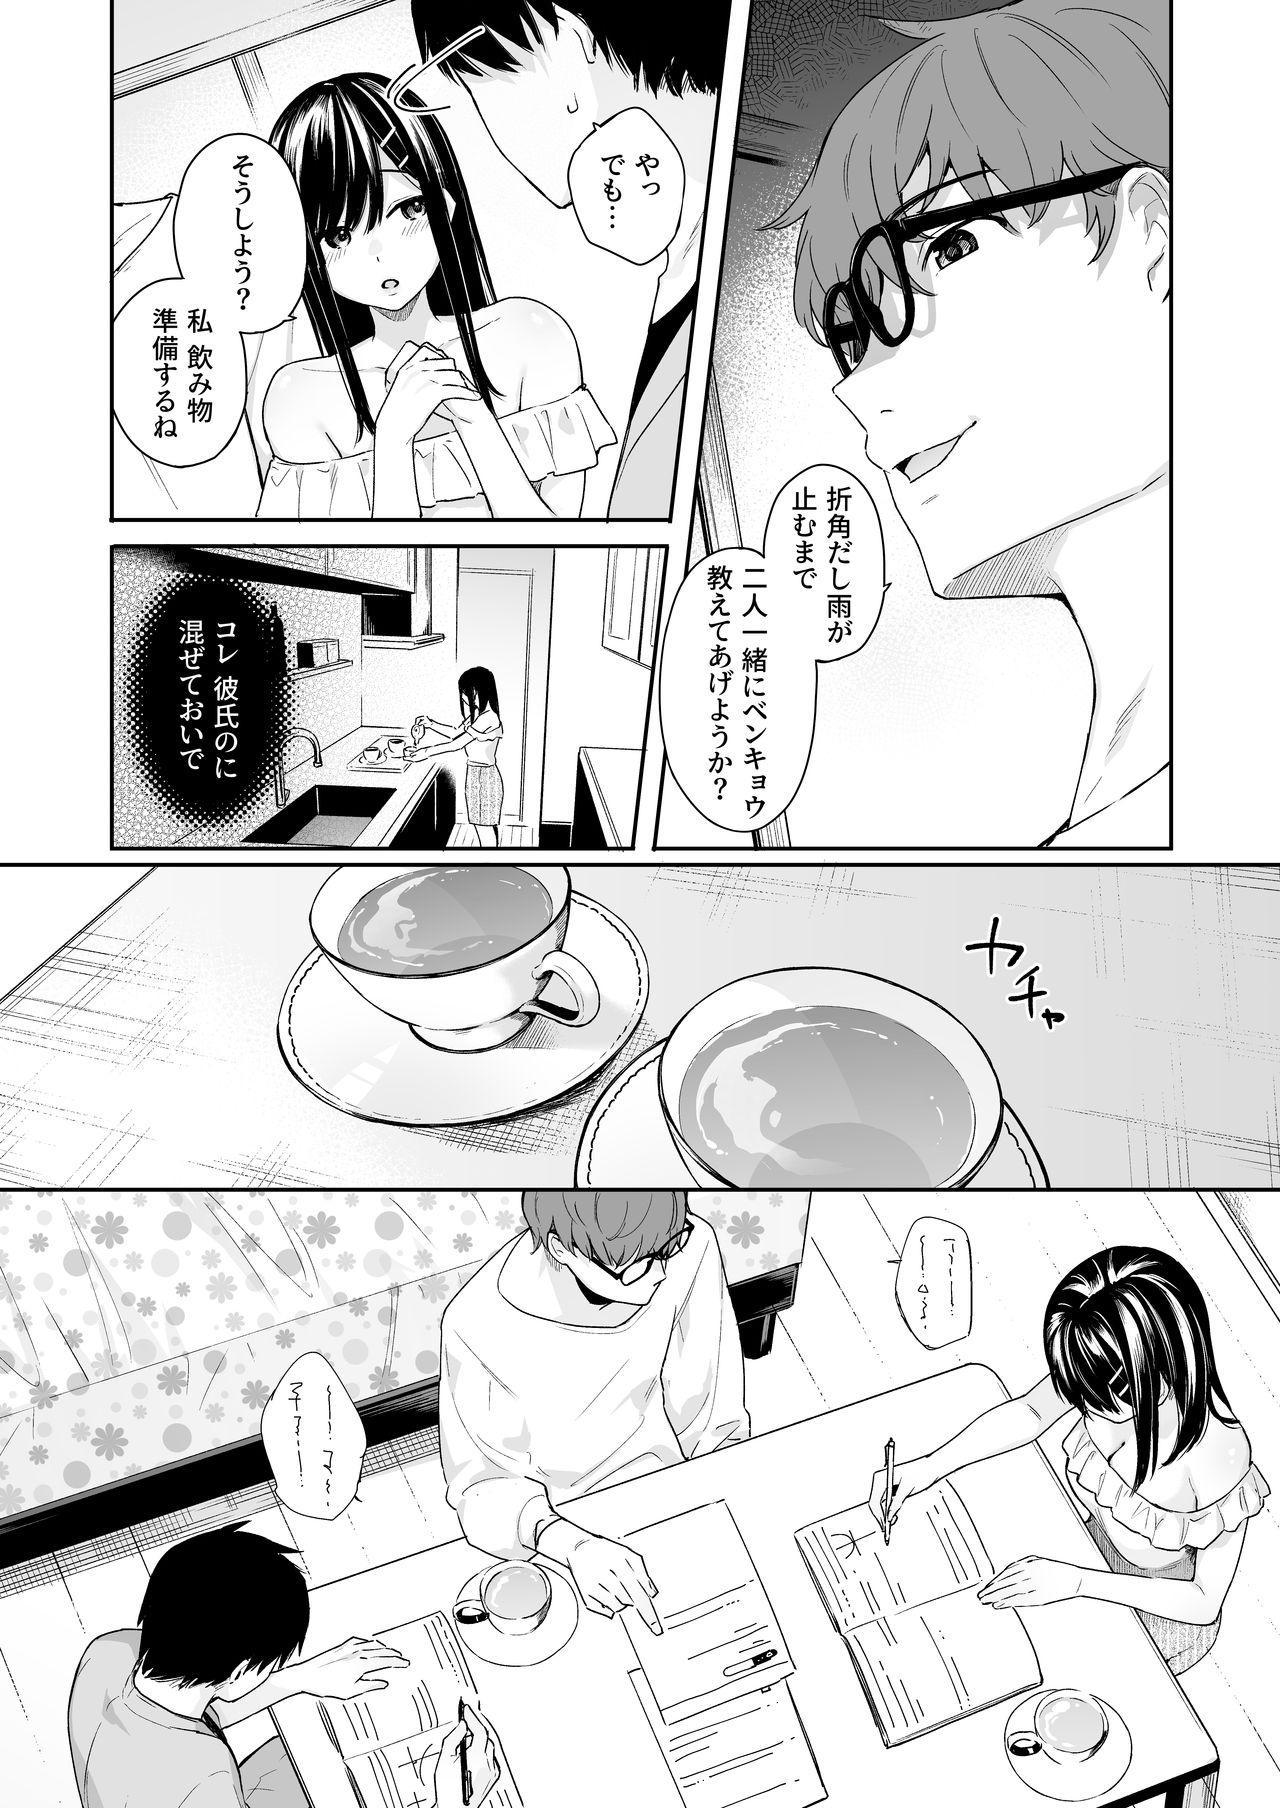 Itomusubi Vol. 4 11